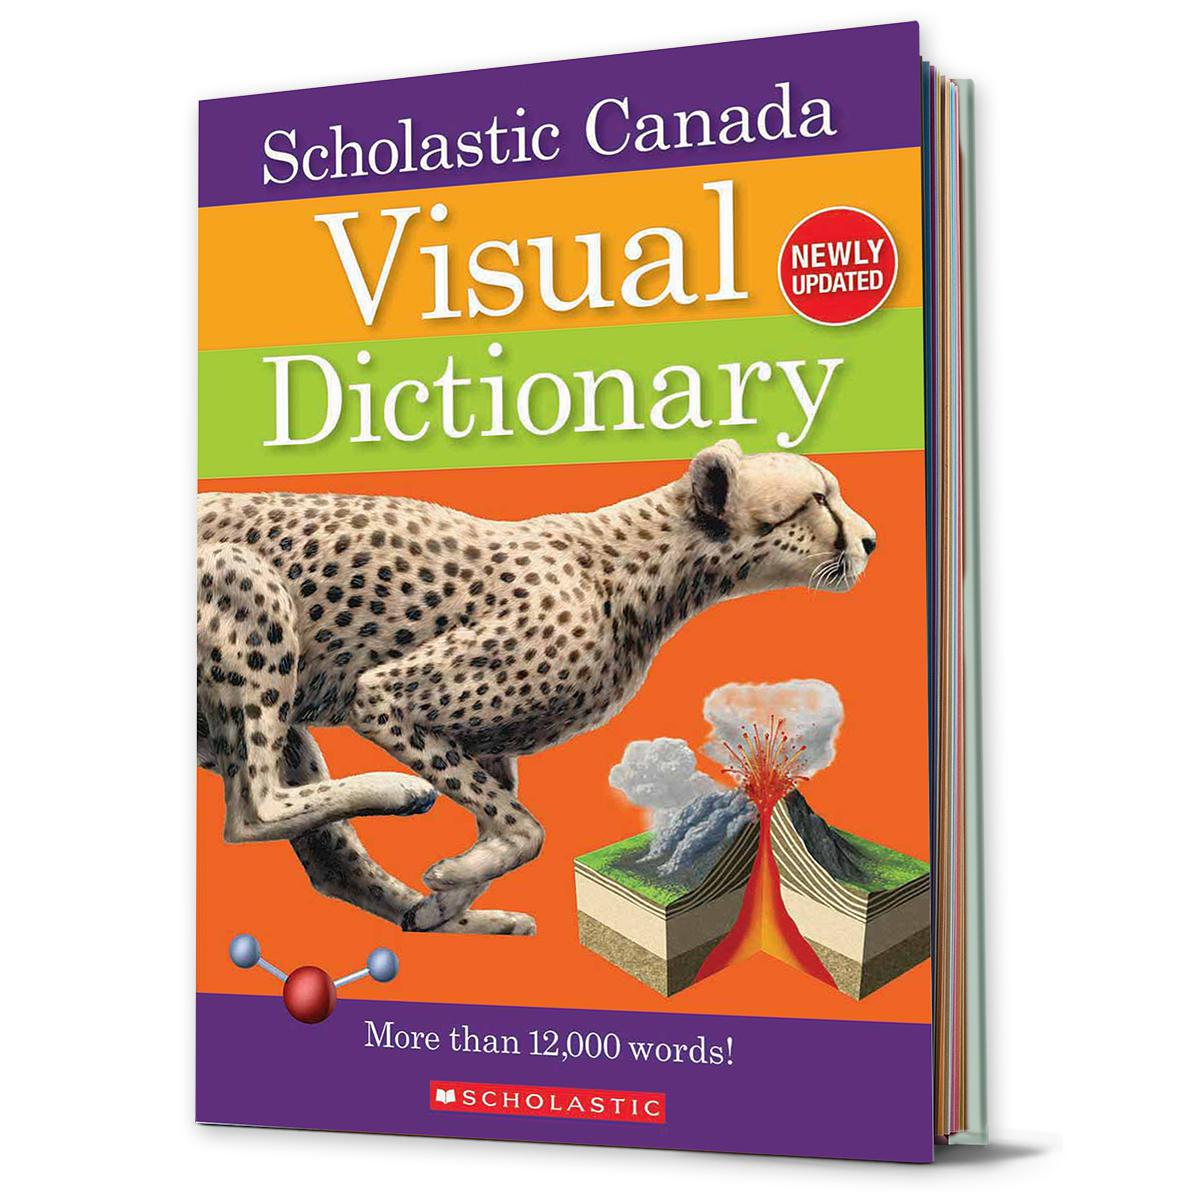 Scholastic Canada: Visual Dictionary